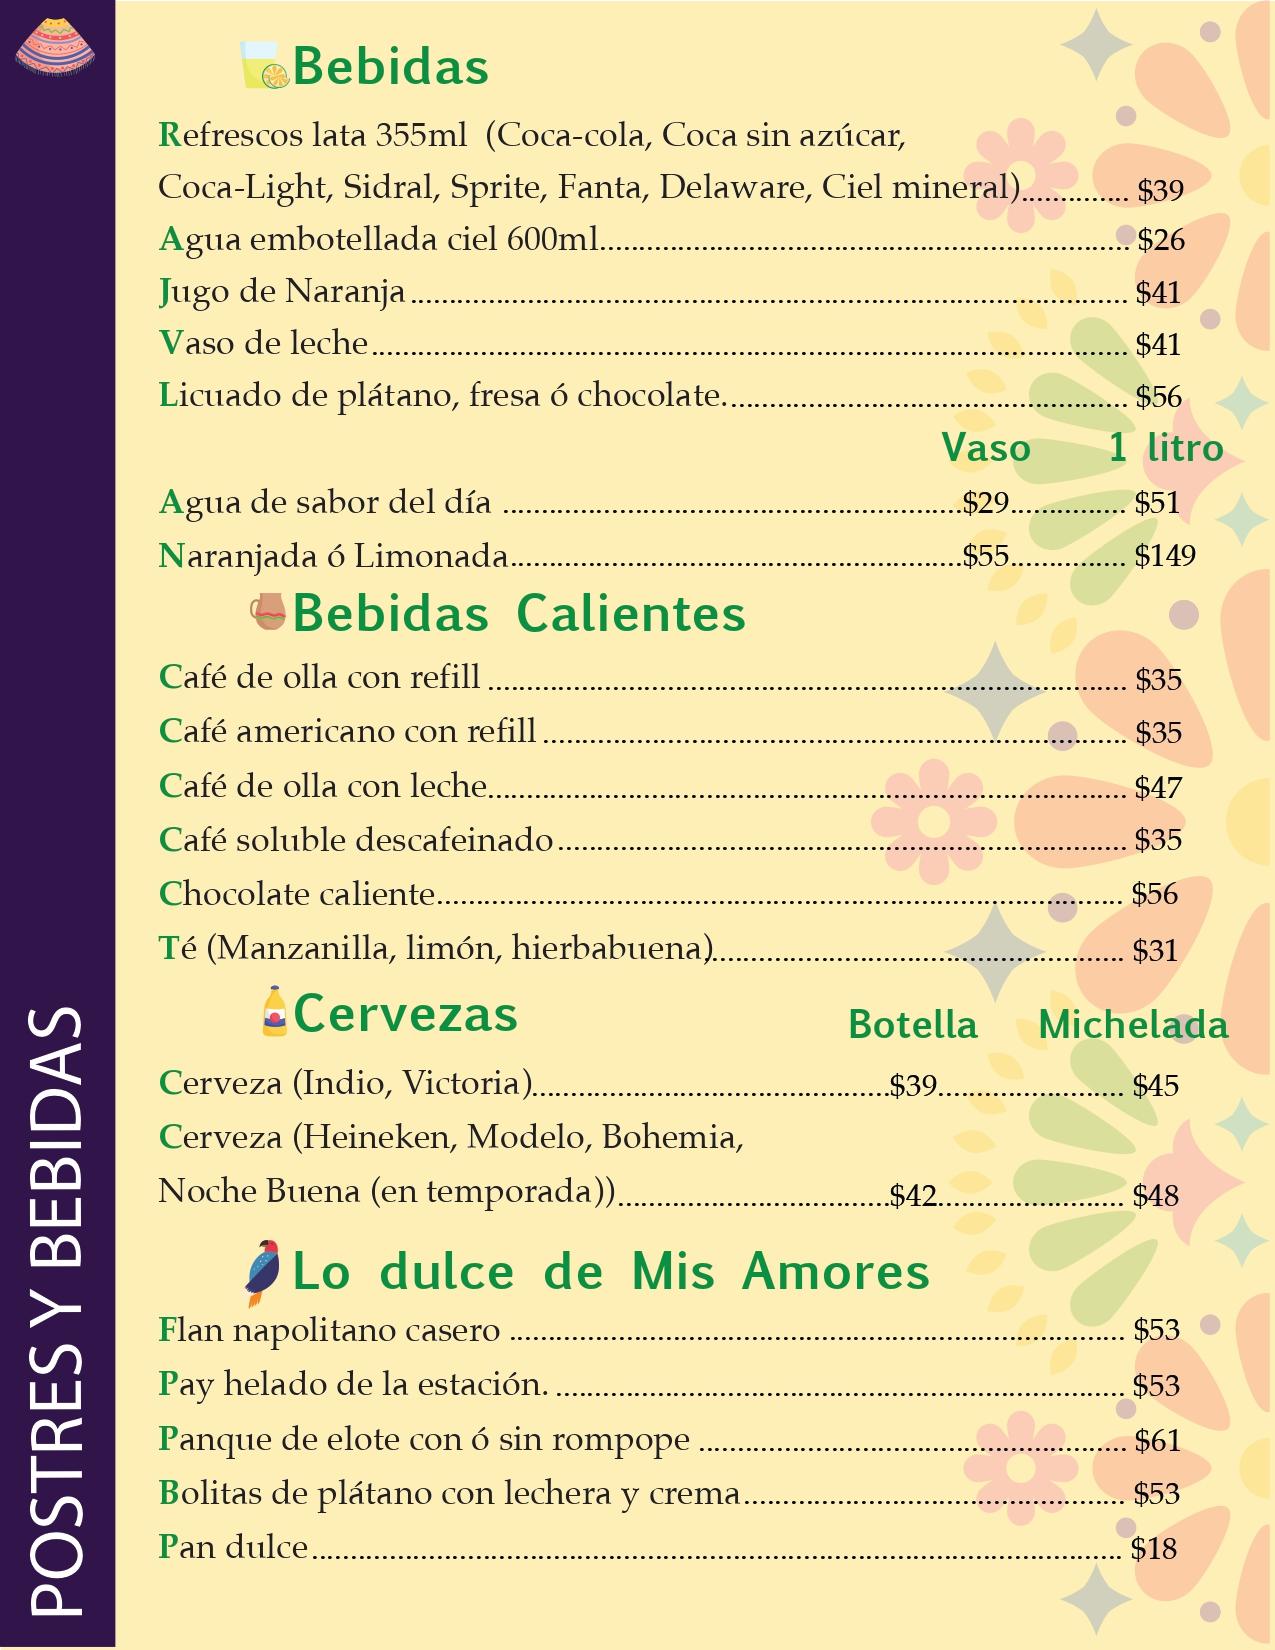 ENCHILADAS, MIS AMORES, ENCHIS, CHILAQUILES,SALSA, GARNACHA, NOGADA, CHILES